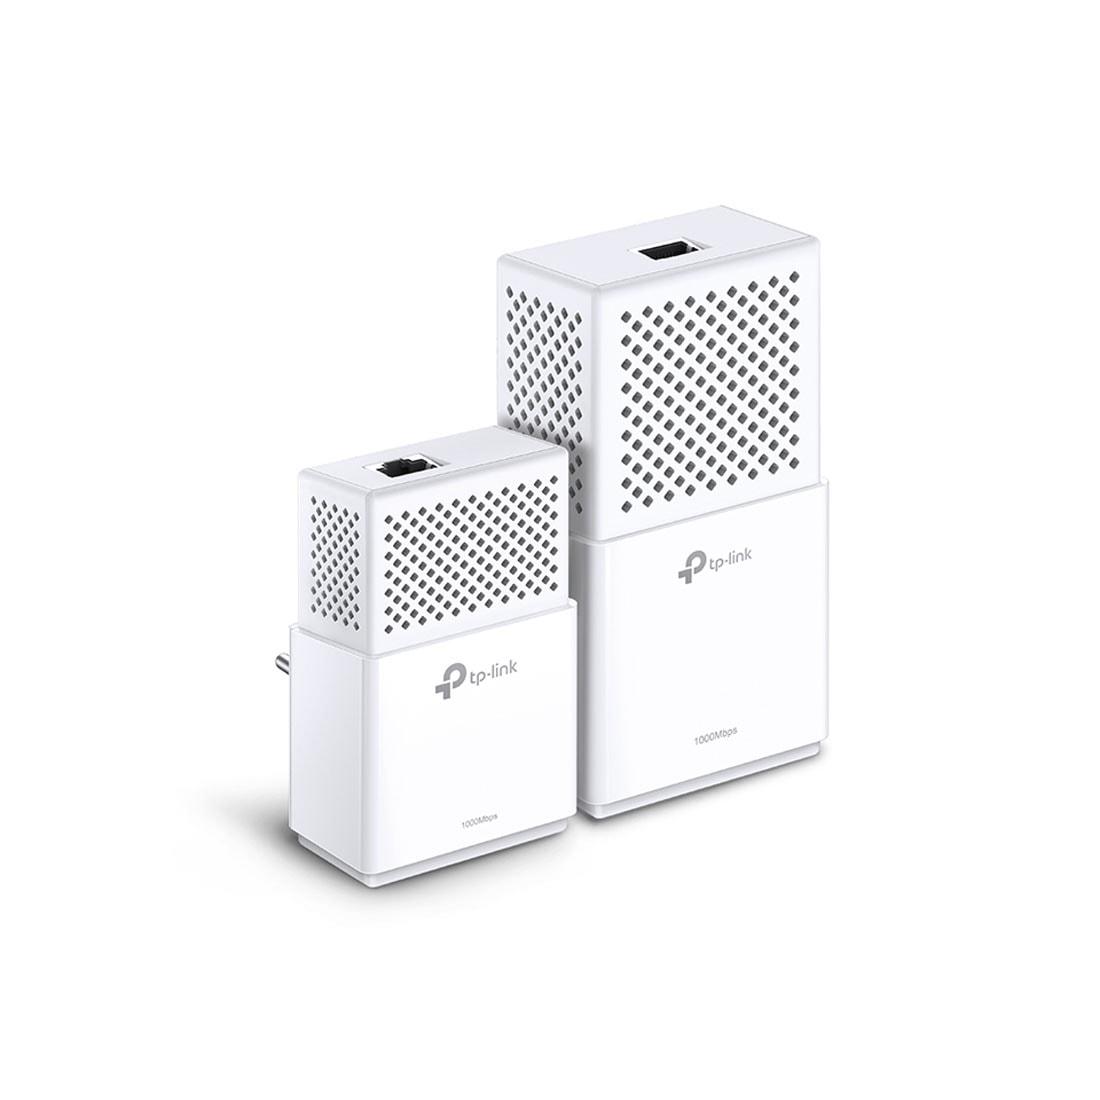 TP-Link TL-WPA7510 KIT (1000Mb) WiFi AC - Pack de 2 - Adaptateur CPL - 0